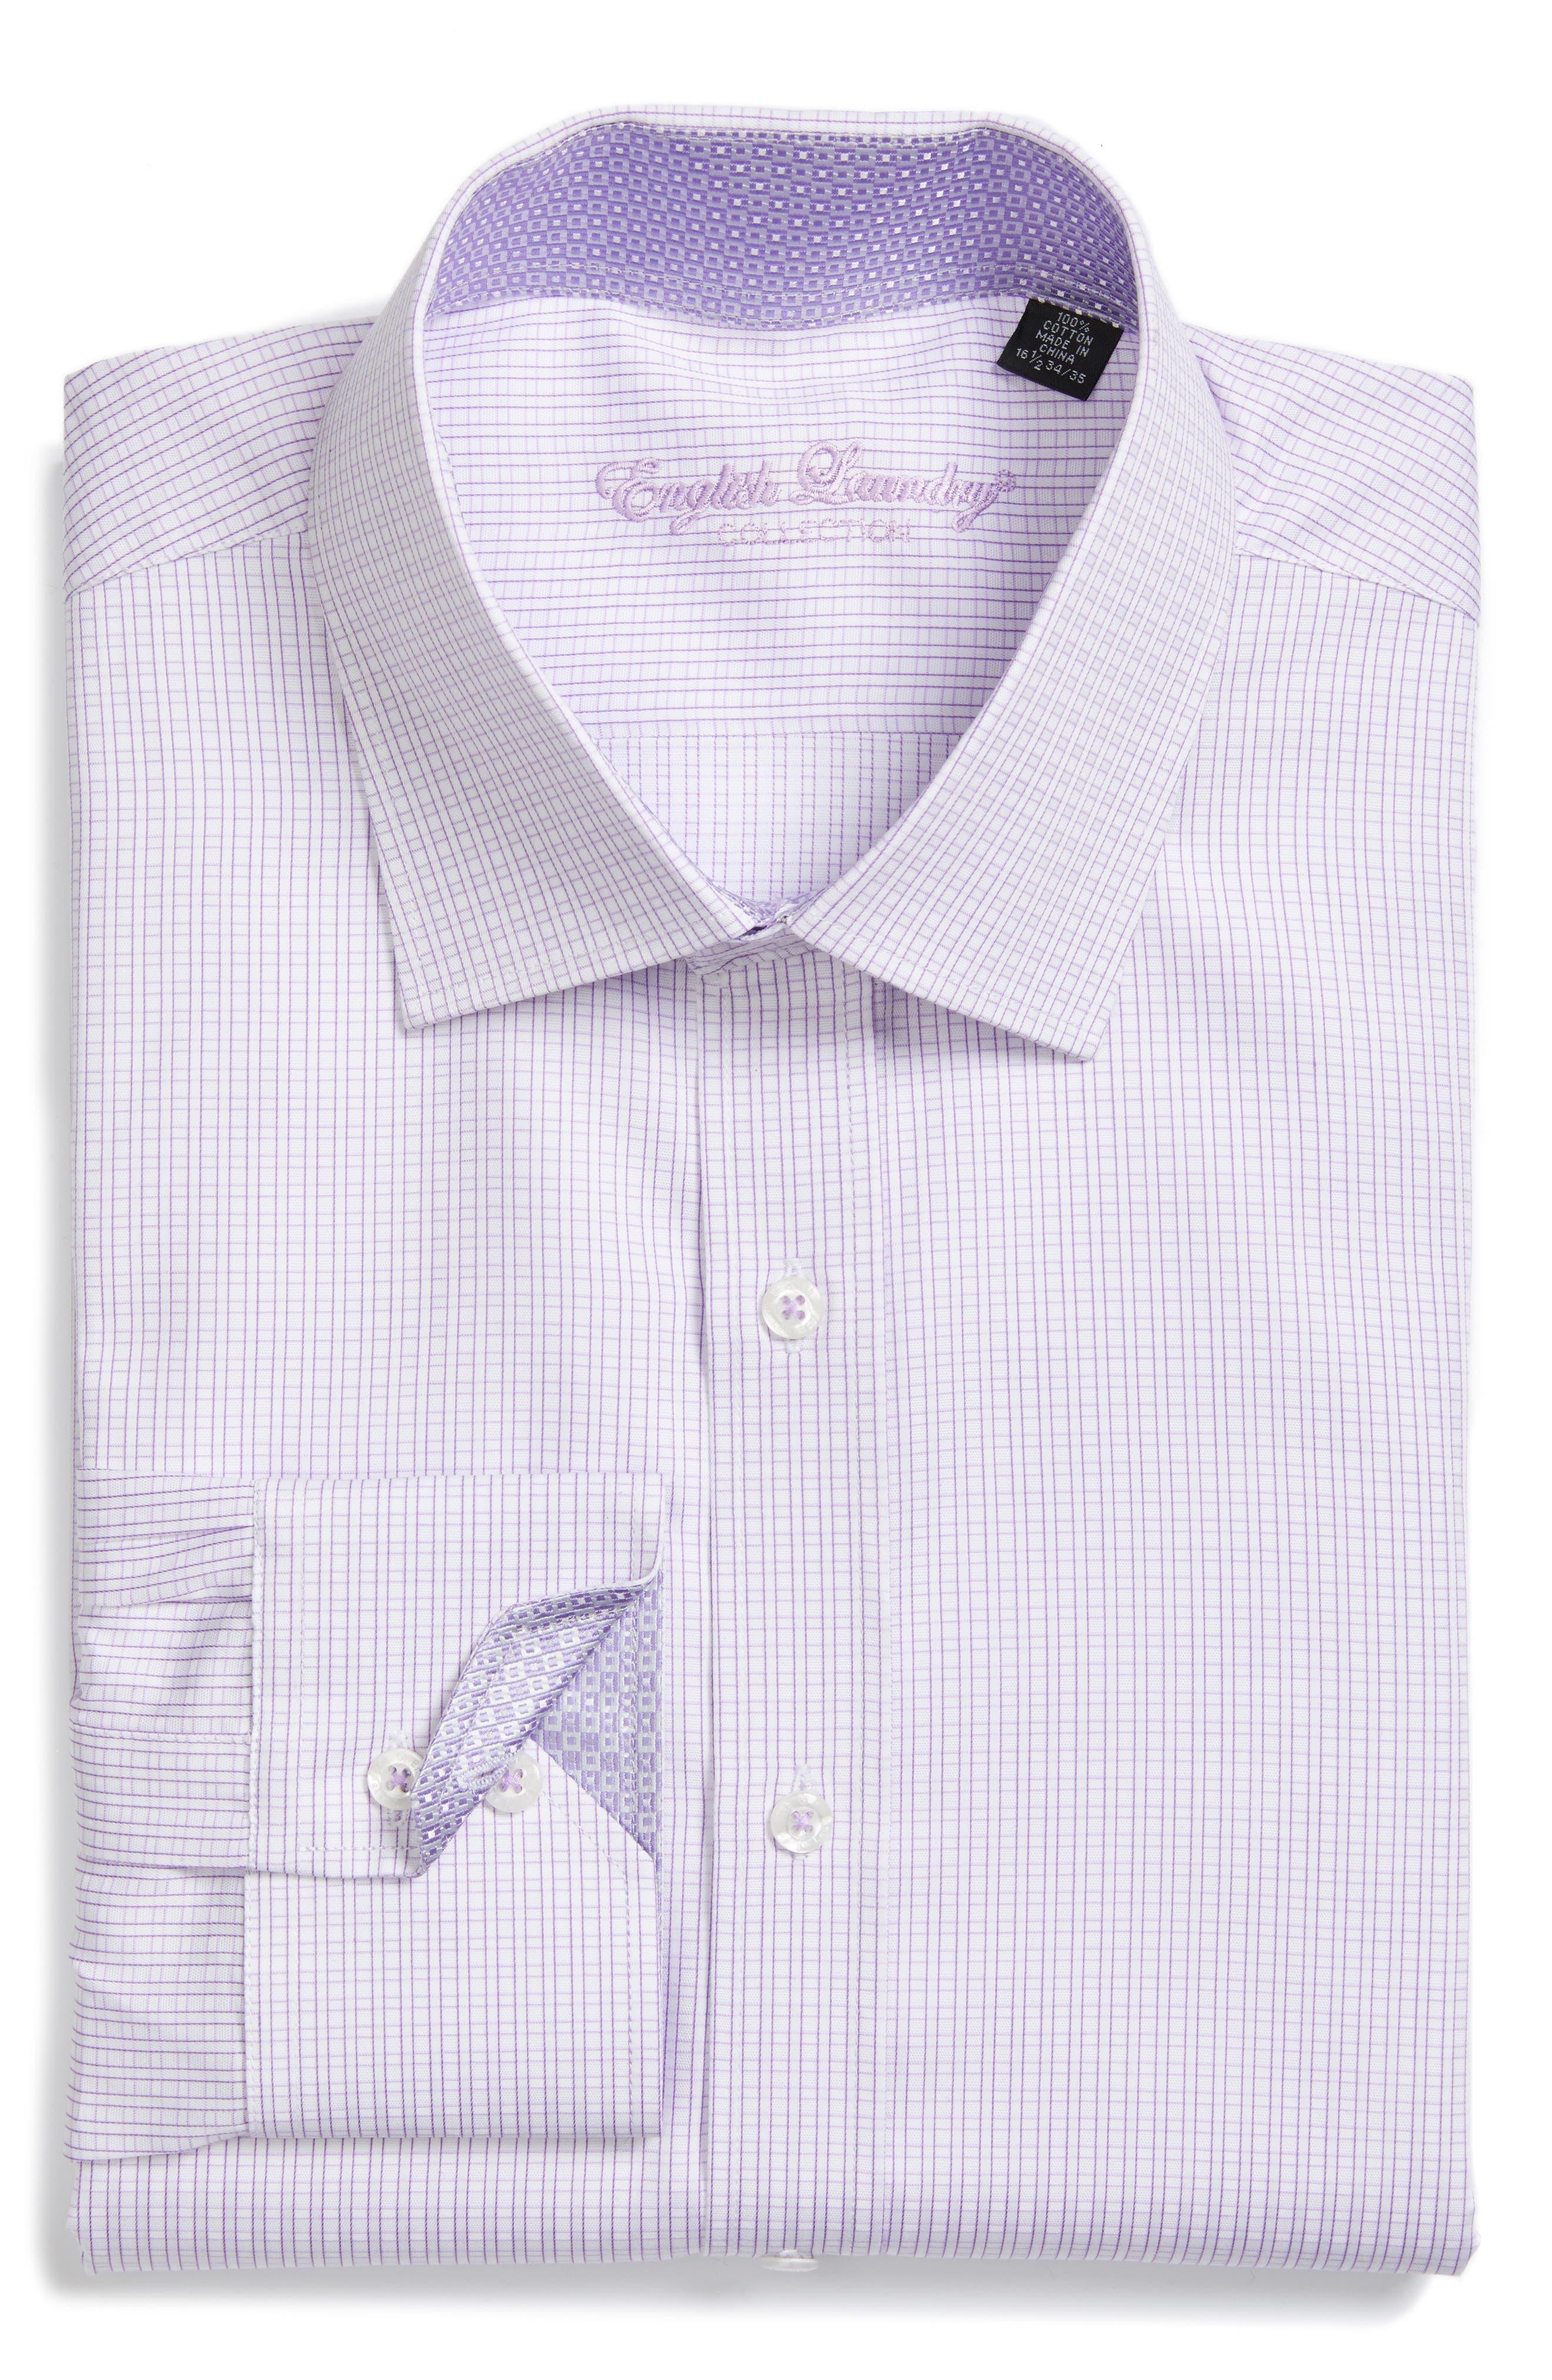 Trim Fit Check Dress Shirt,                             Main thumbnail 1, color,                             530